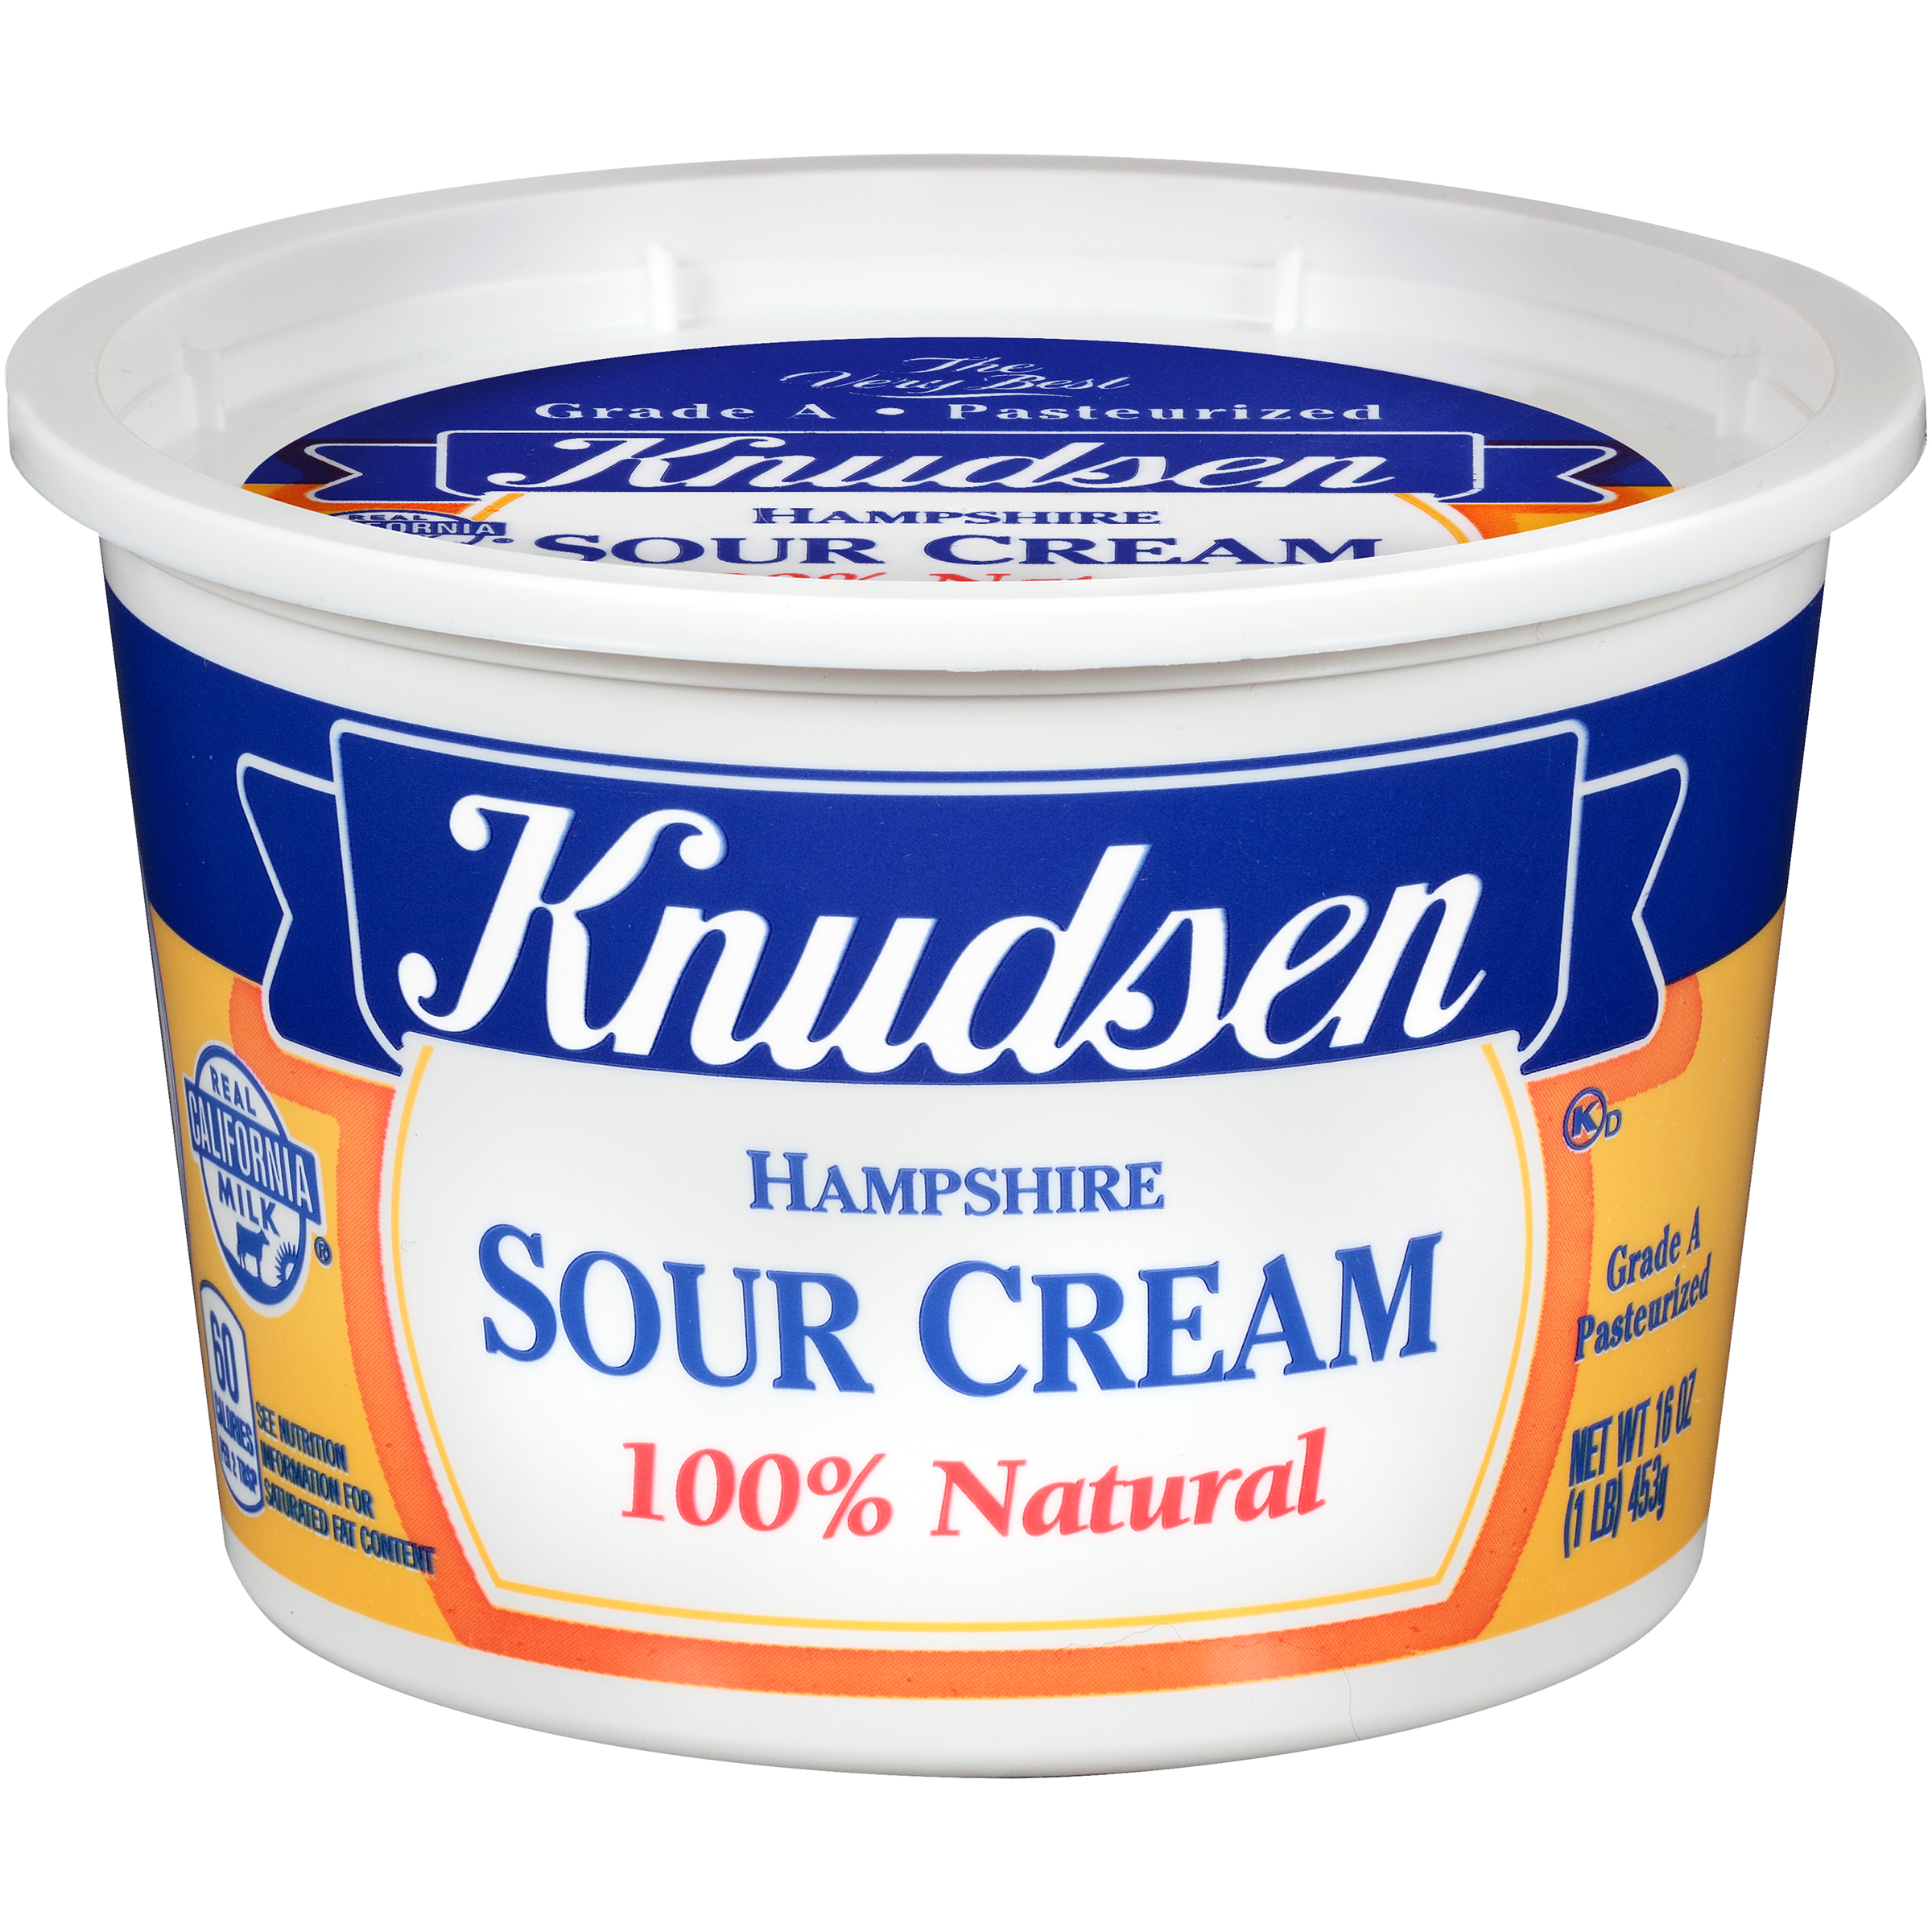 Knudsen 100% Natural Hampshire Sour Cream, 16 oz